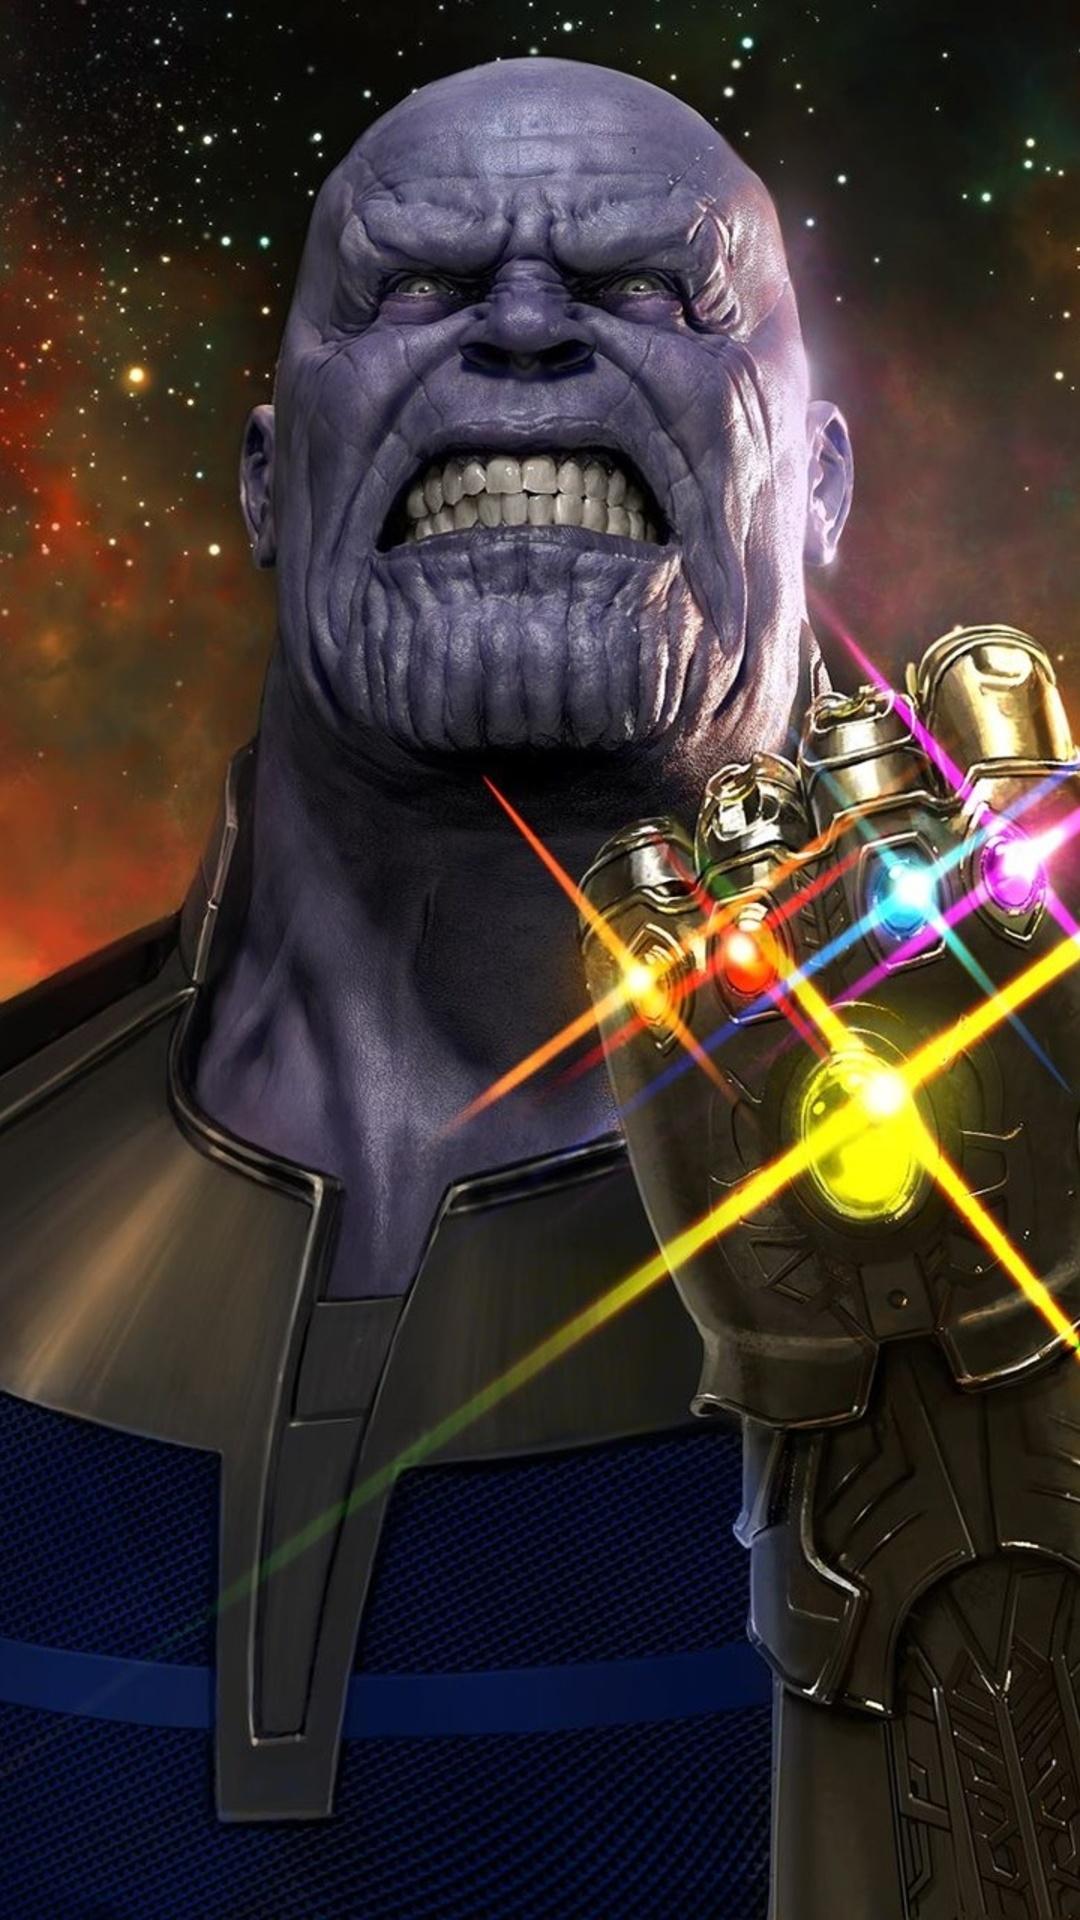 Girl Gangster Wallpaper 1080x1920 Thanos Avengers Infinity War Iphone 7 6s 6 Plus